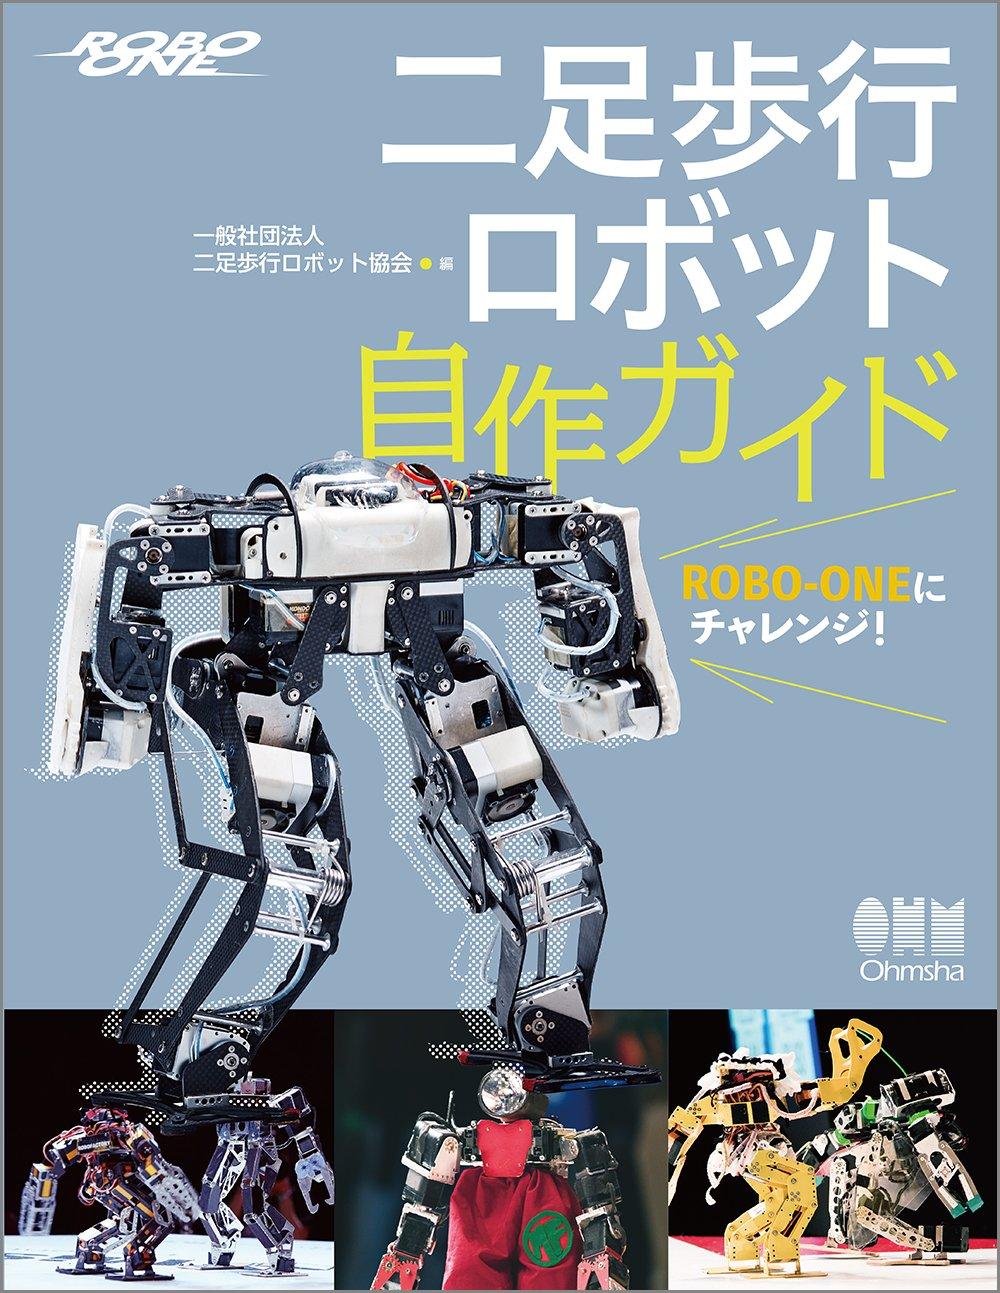 ROBO-ONEにチャレンジ! 二足歩行ロボット自作ガイド | 二足歩行 ...